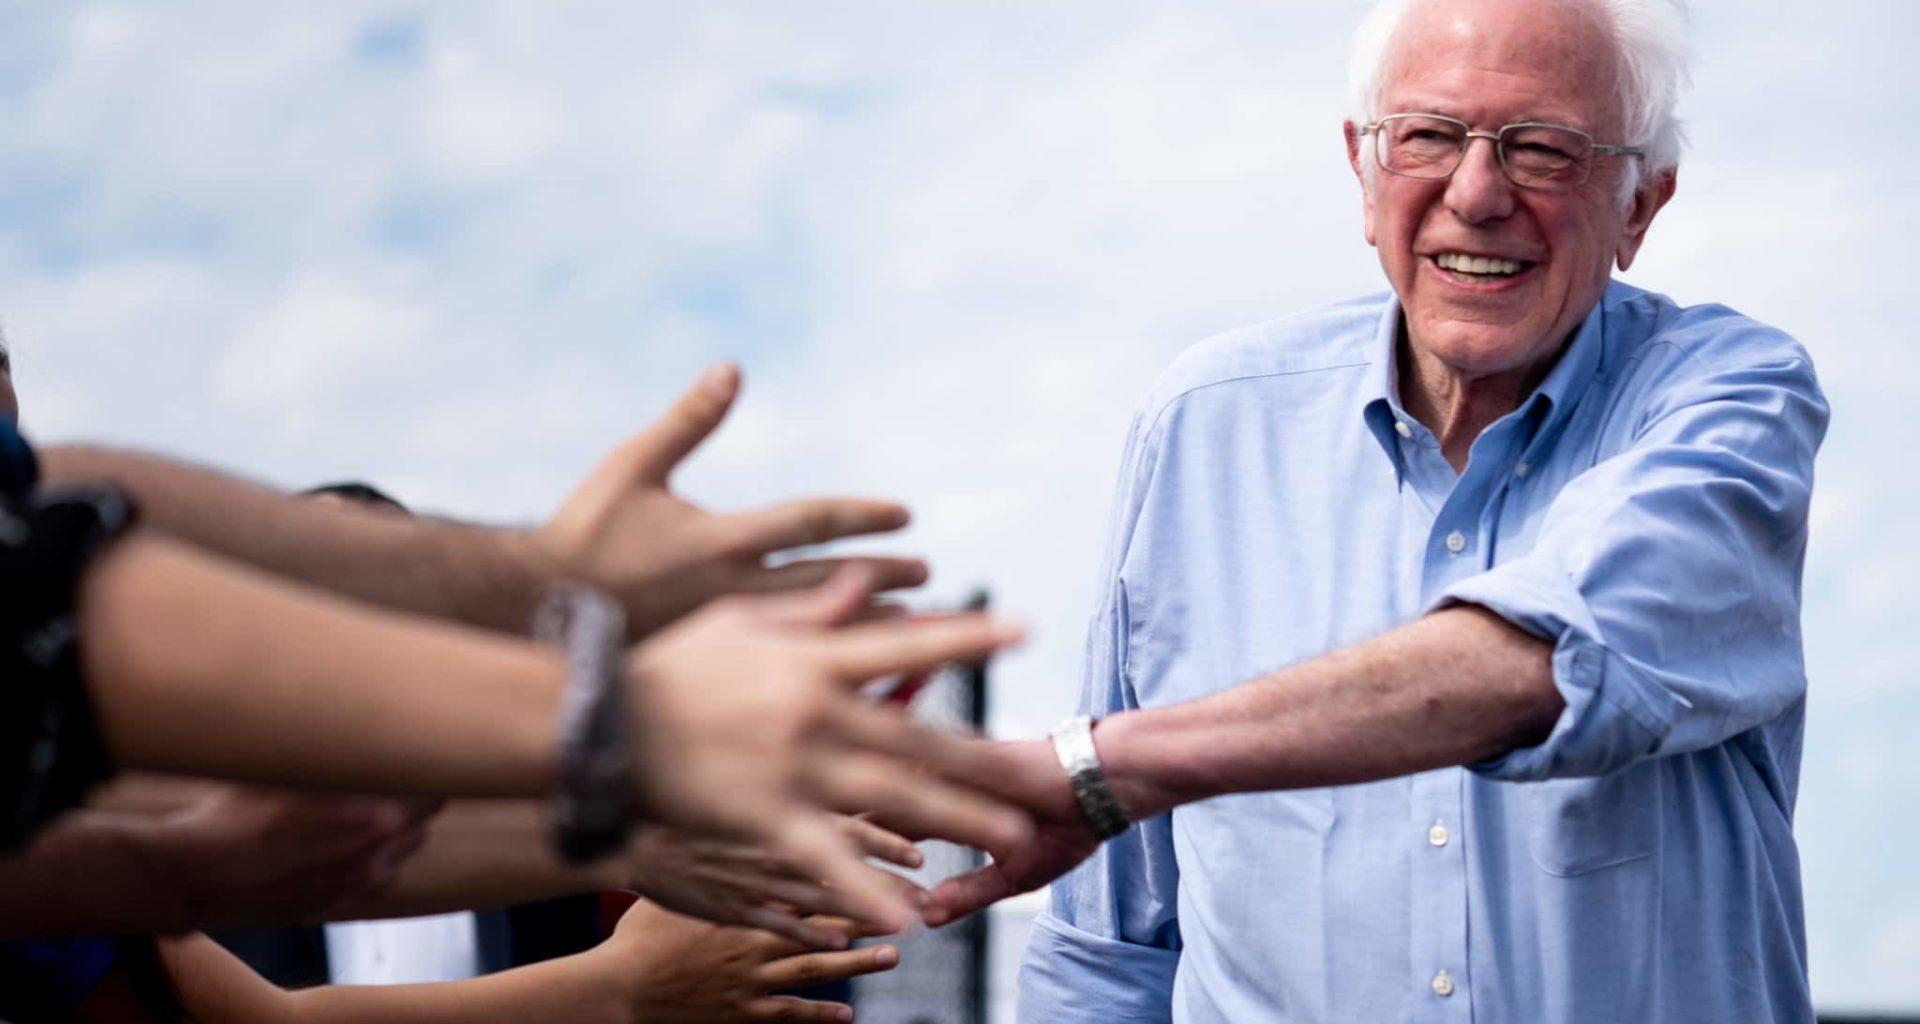 Elizabeth Warren Faces Online Attacks Over Bernie's MA Loss